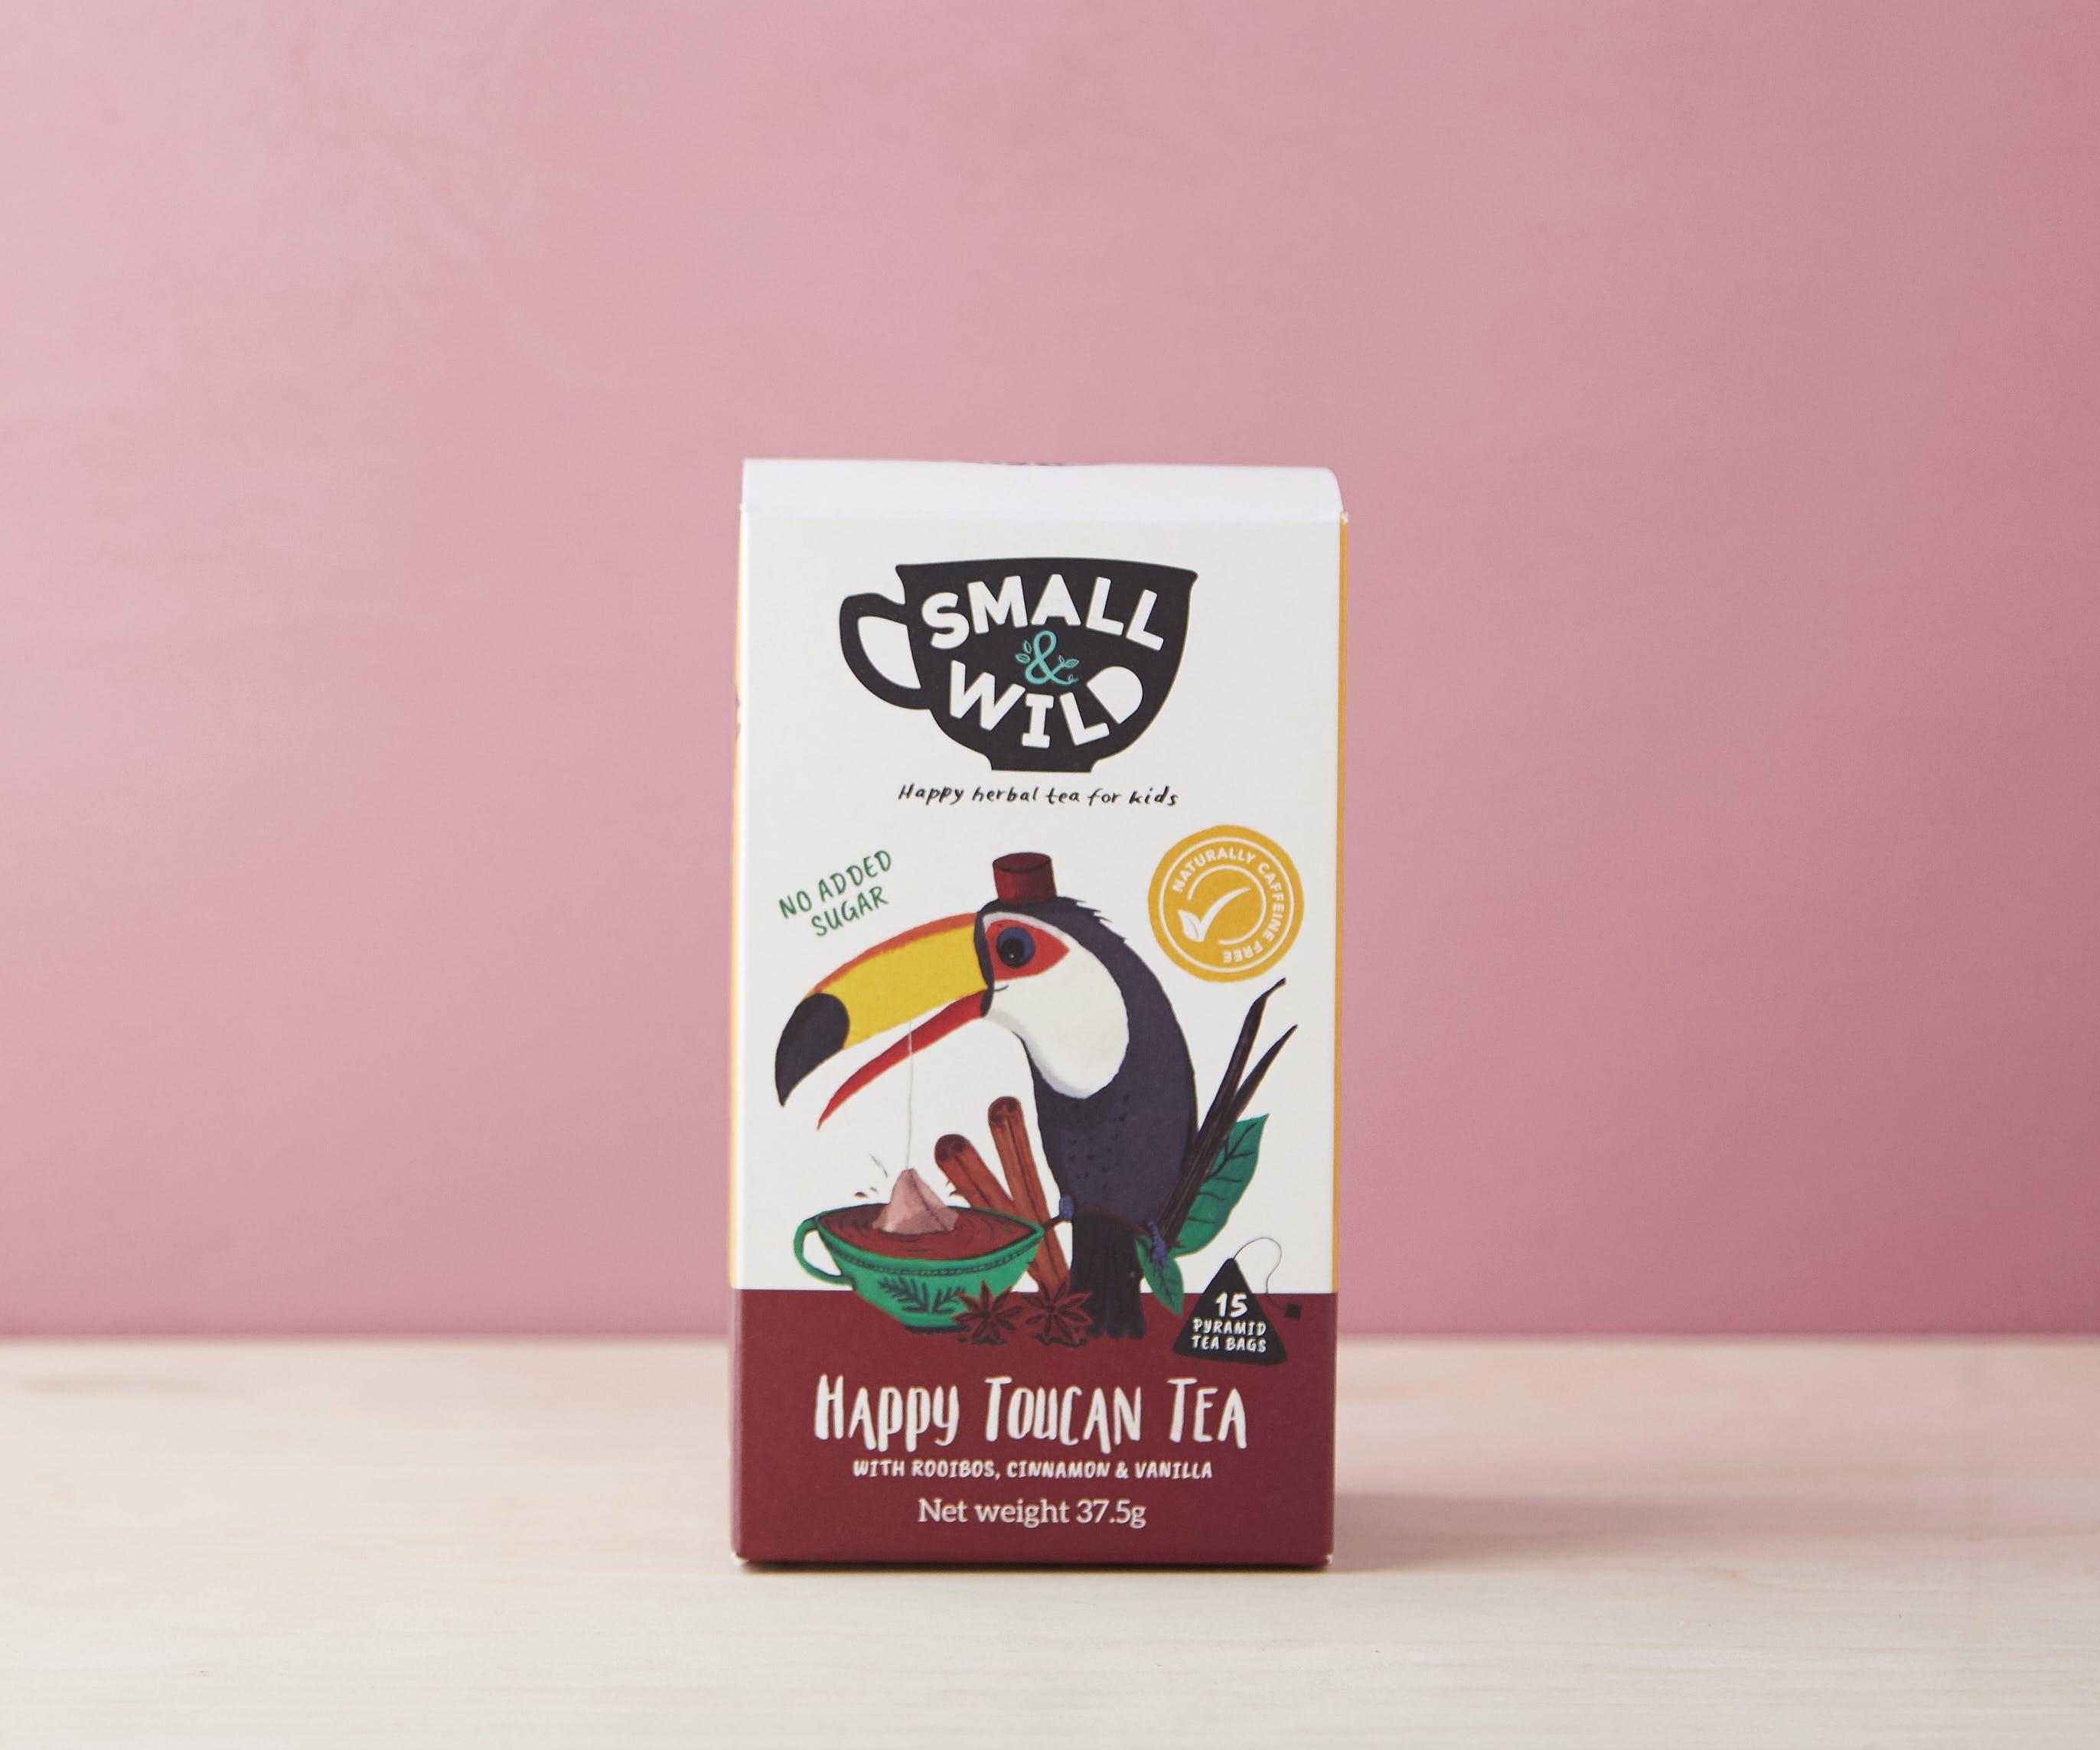 Kids Tea - Rooibos, Cinnamon & Vanilla